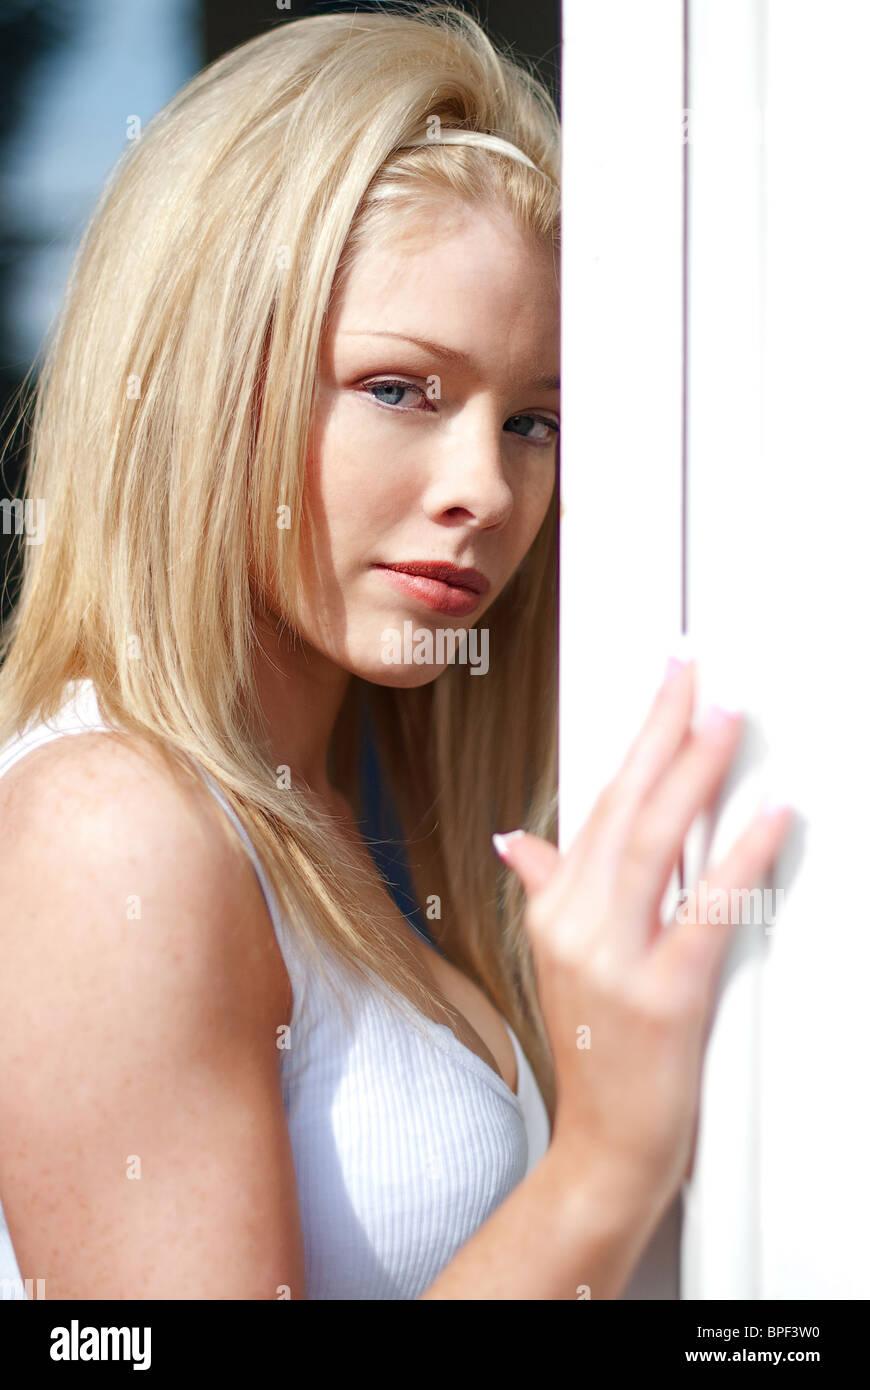 Headshot Of Blonde Model Stock Photo Alamy